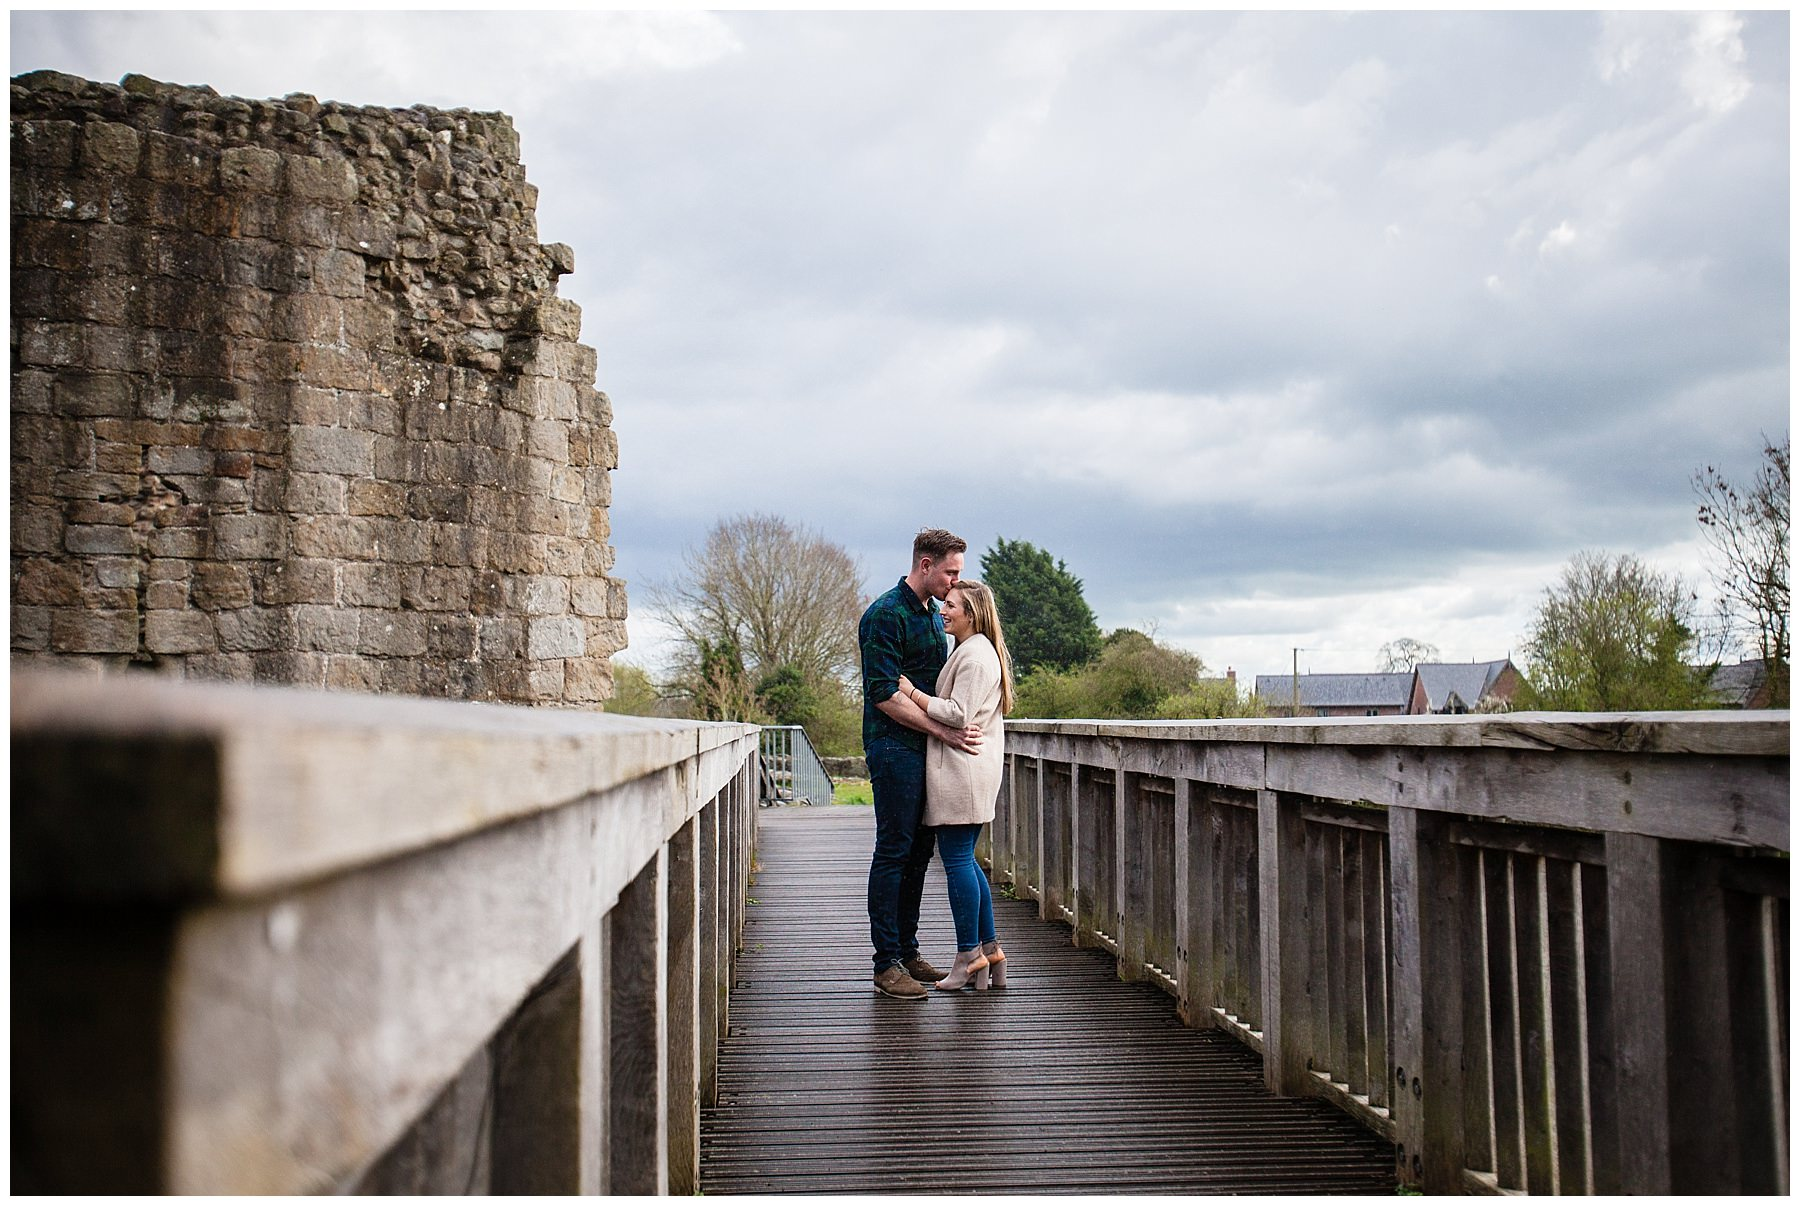 happy couple chatting on the bridge at whttington castle- charlotte giddings photography